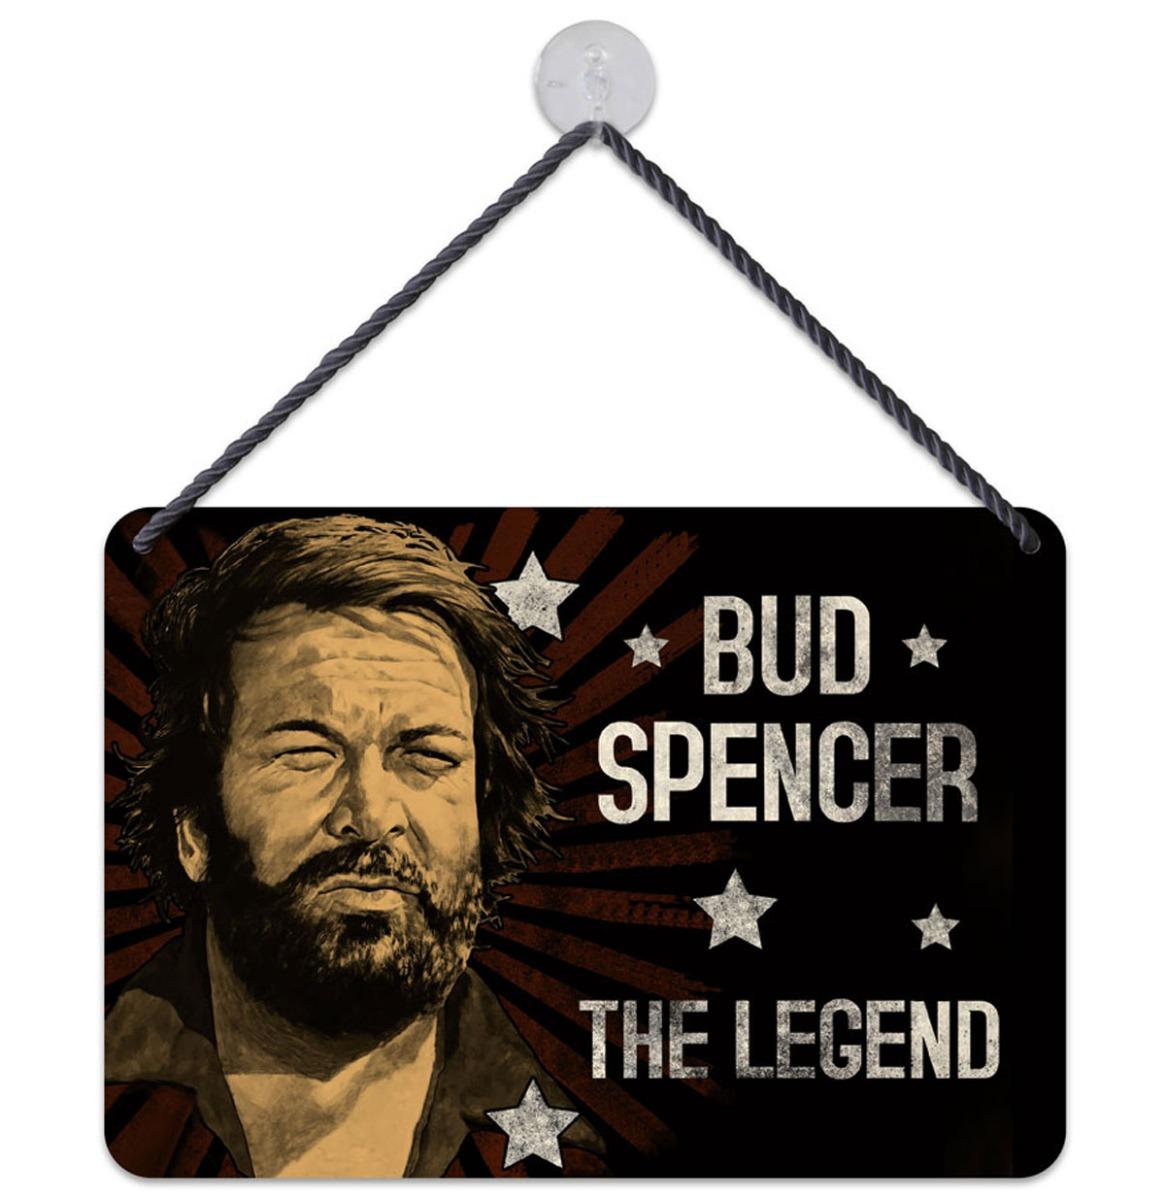 Bud Spencer The Legend Hangend Bord 16,5 x 11,5 cm